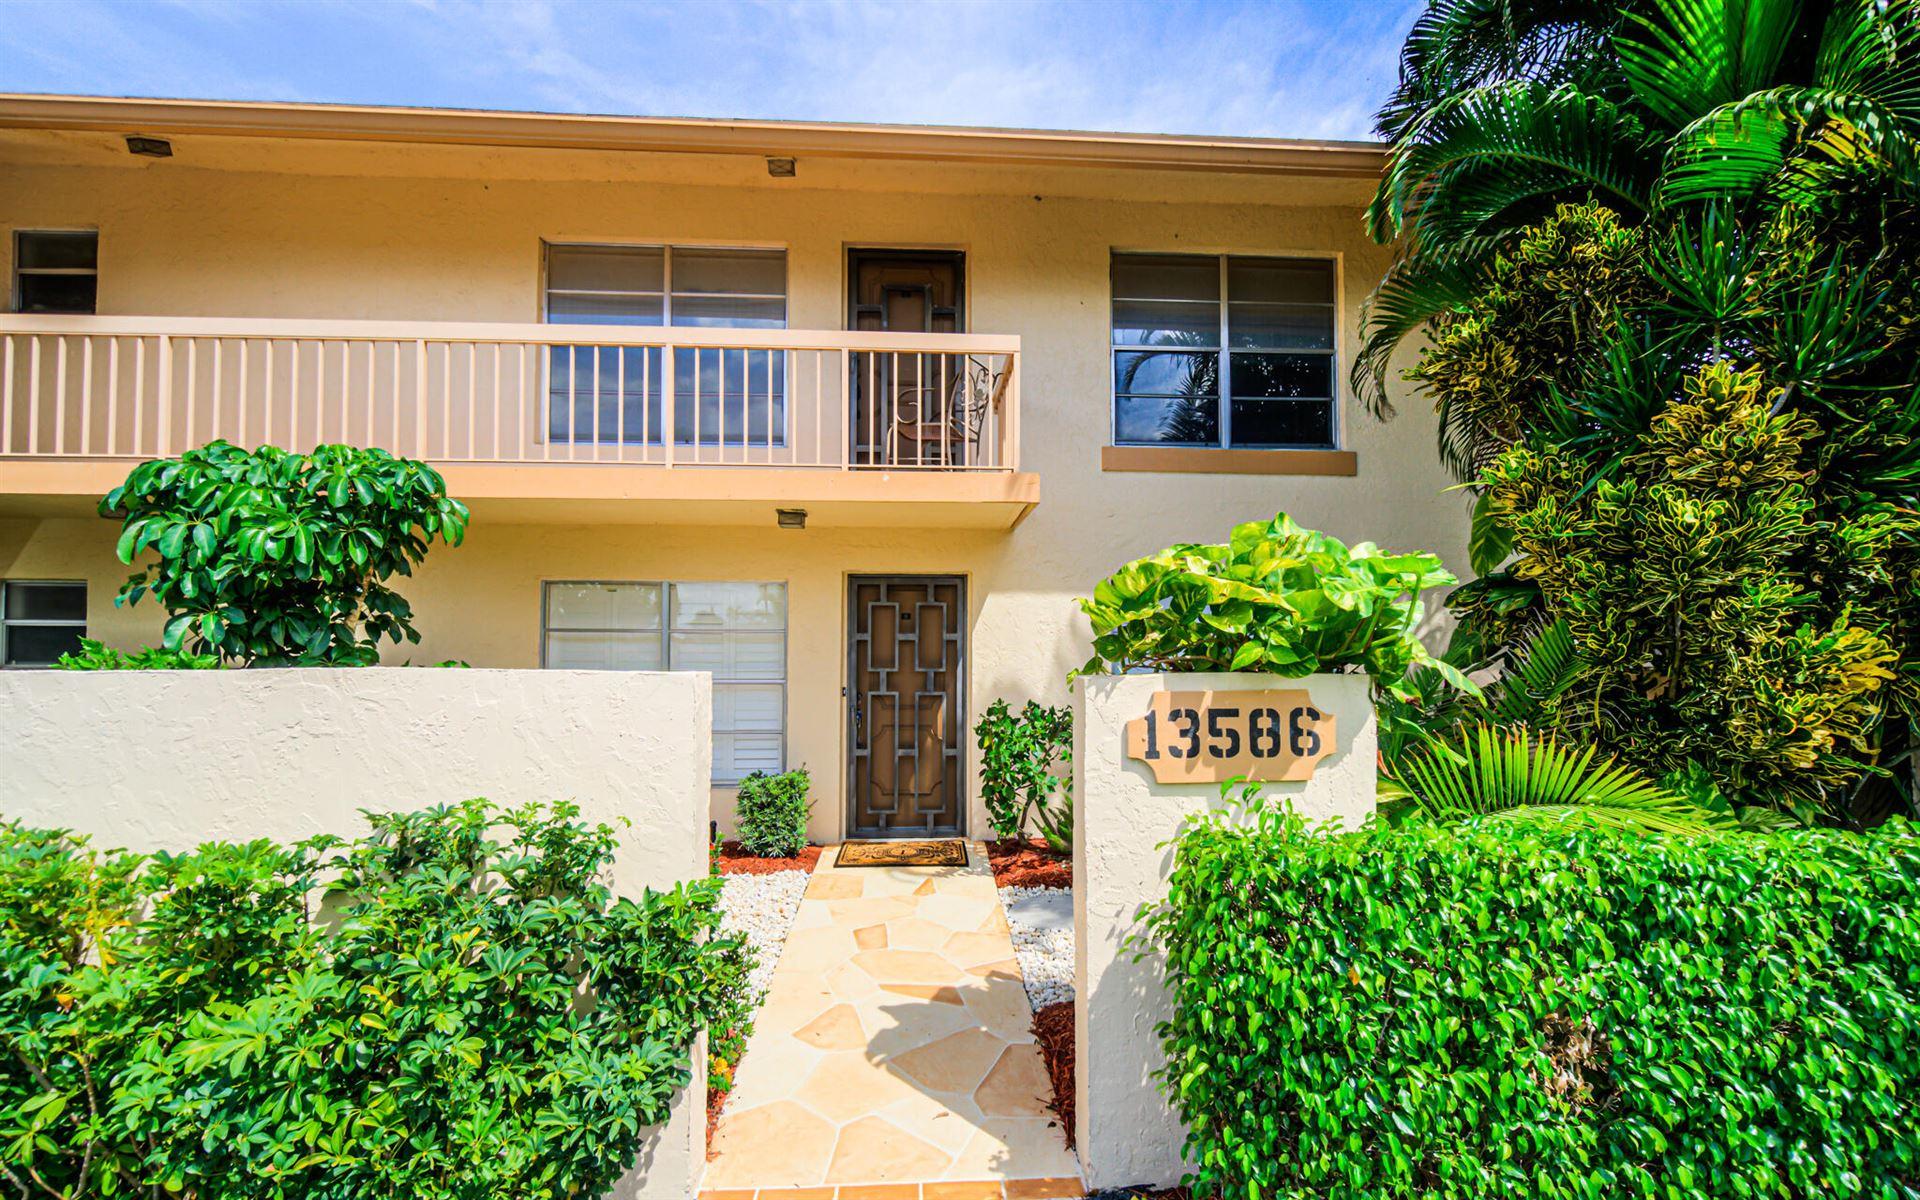 13586 Sabal Palm Court #B, Delray Beach, FL 33484 - MLS#: RX-10745305